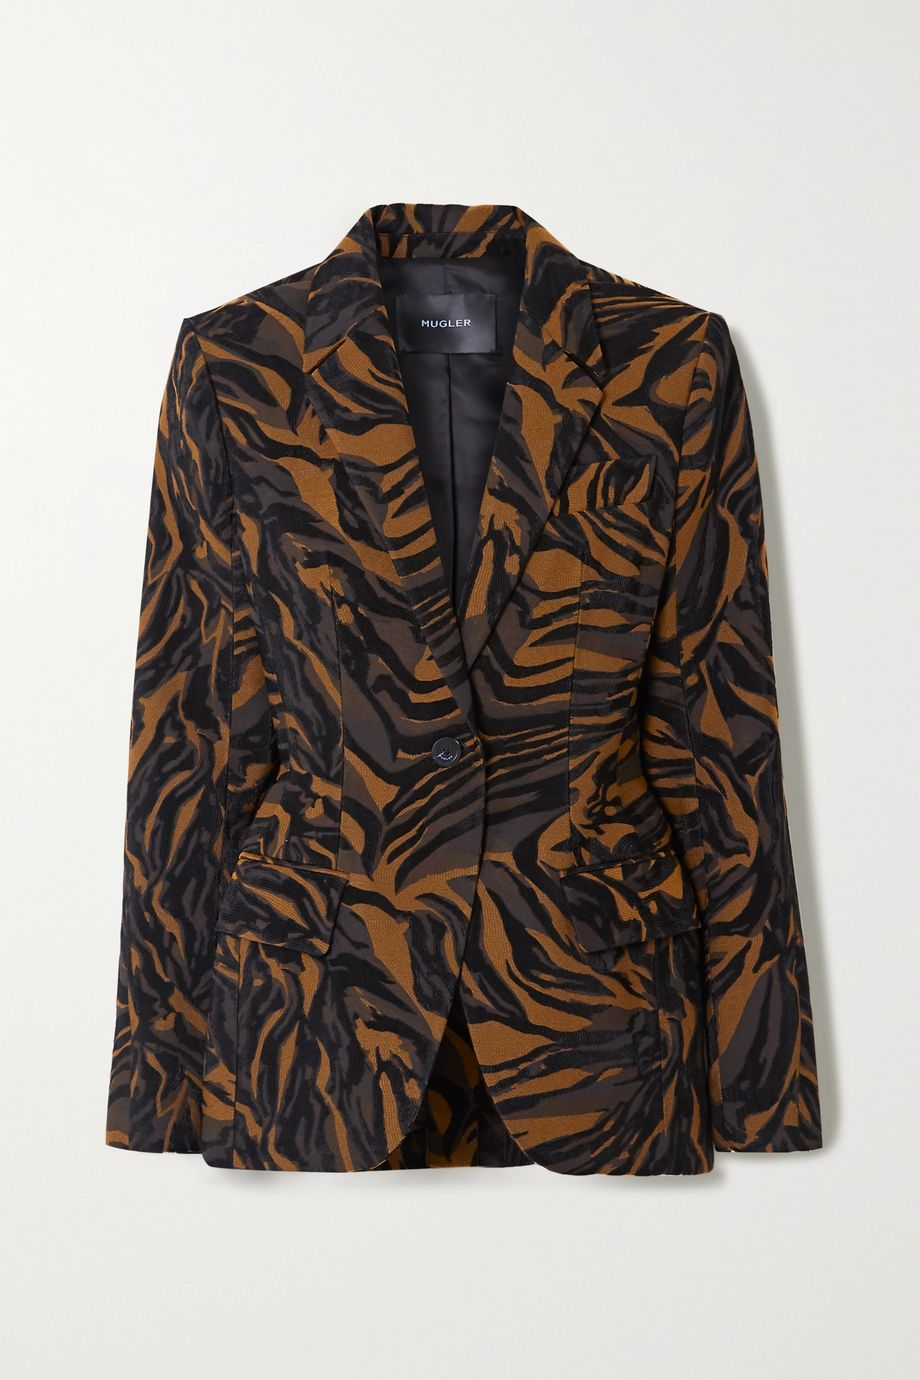 Mugler Tiger-jacquard blazer